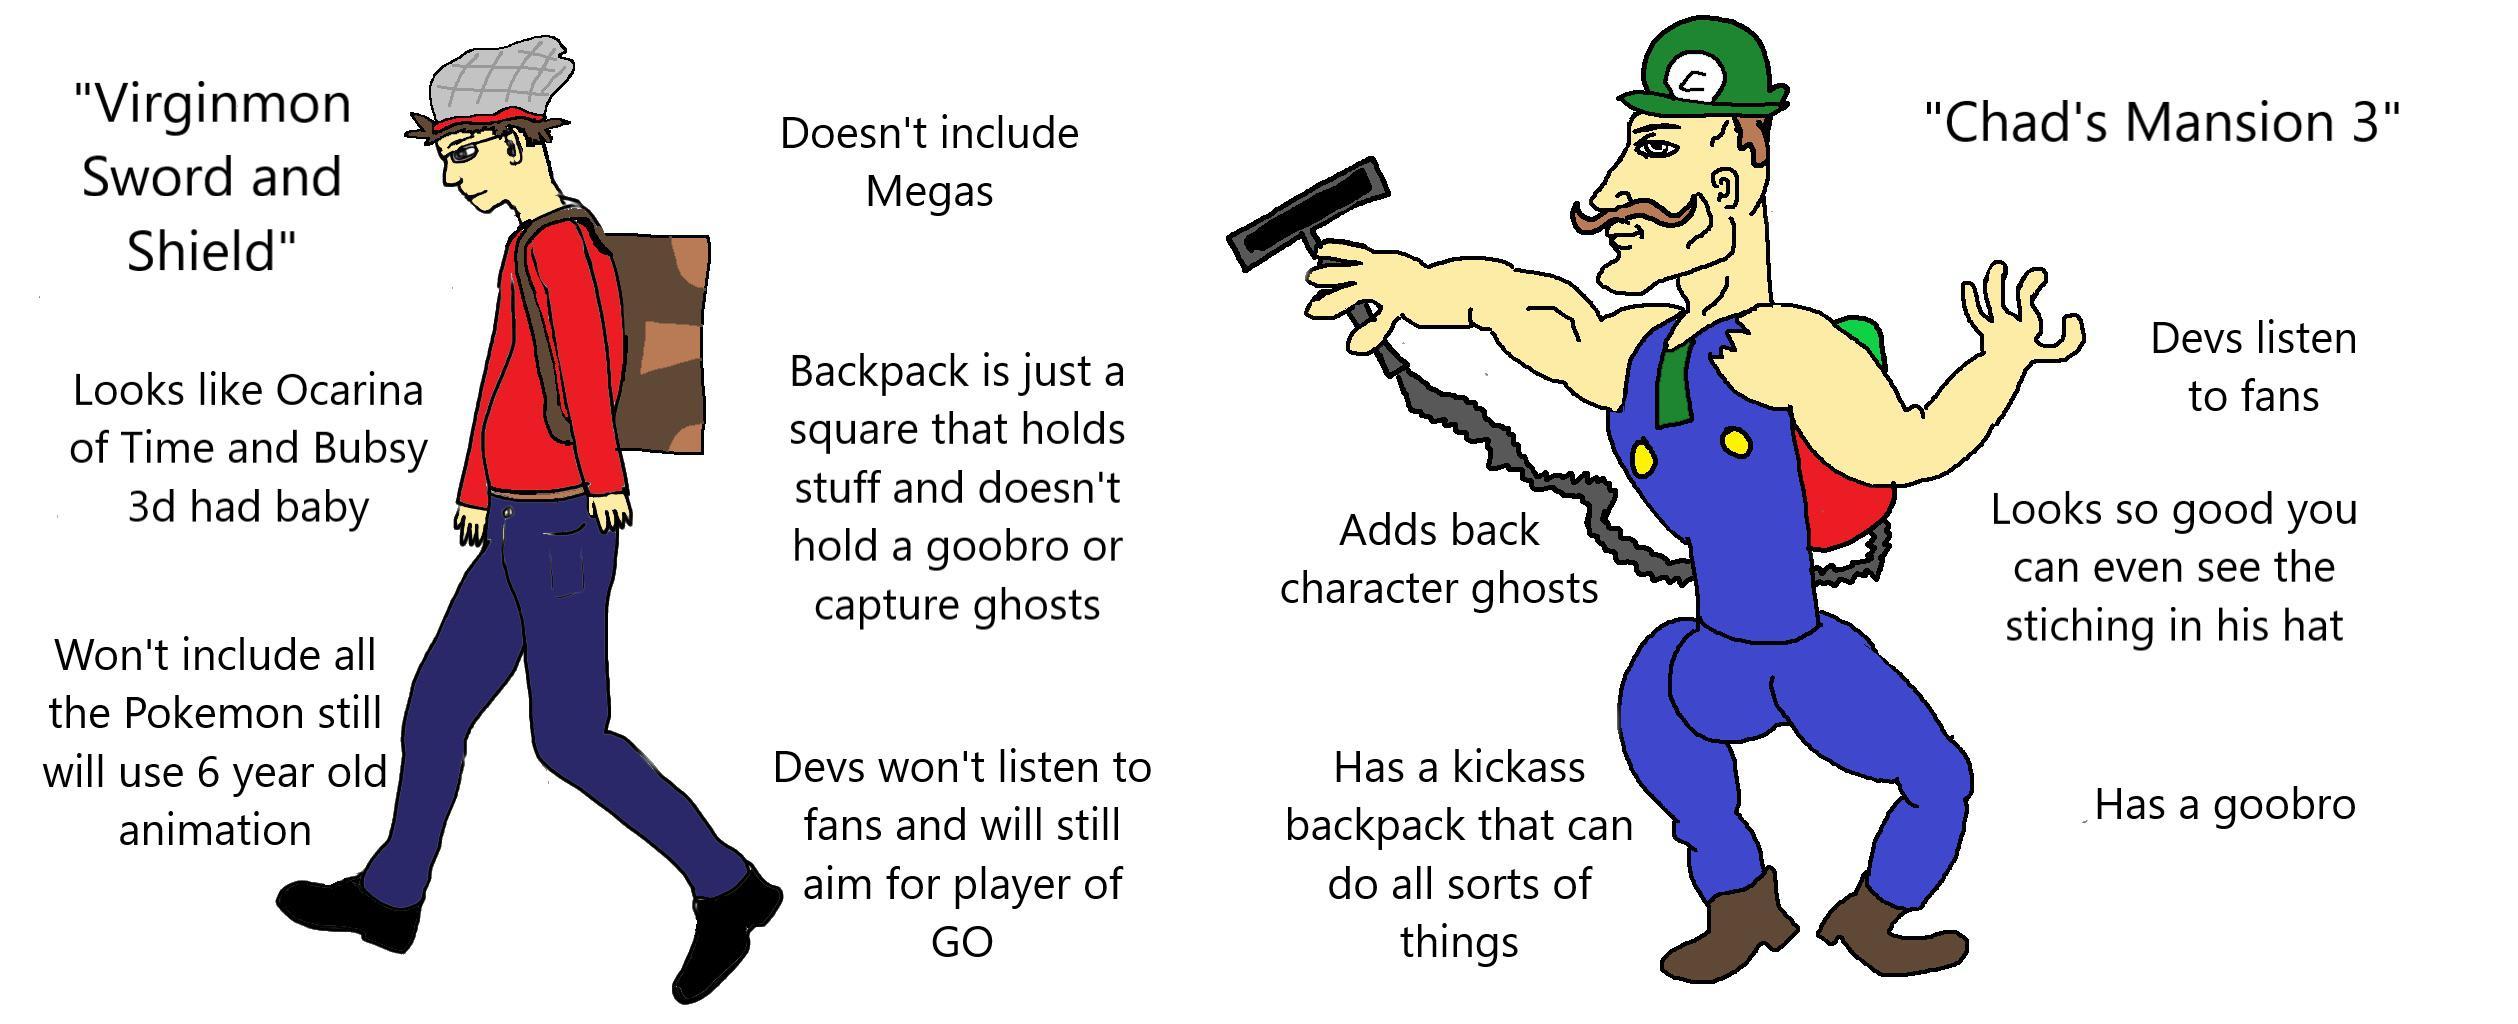 The Virgin Pokemon Sword And Shield Vs The Chad Luigi S Mansion 3